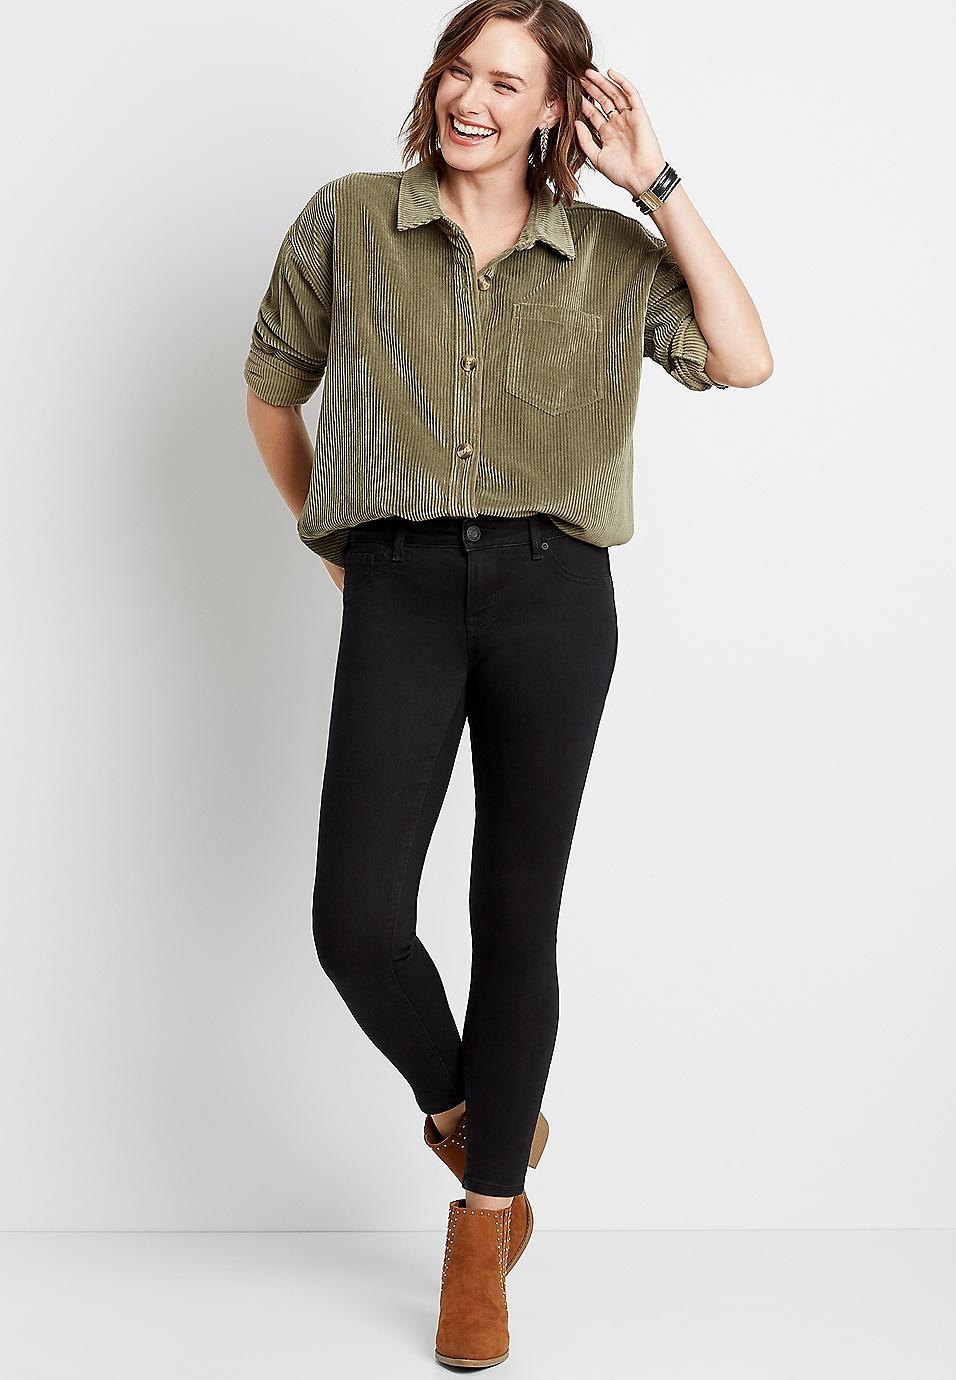 c399cb55e Everflex™ high rise black stretch skinny jeans   maurices